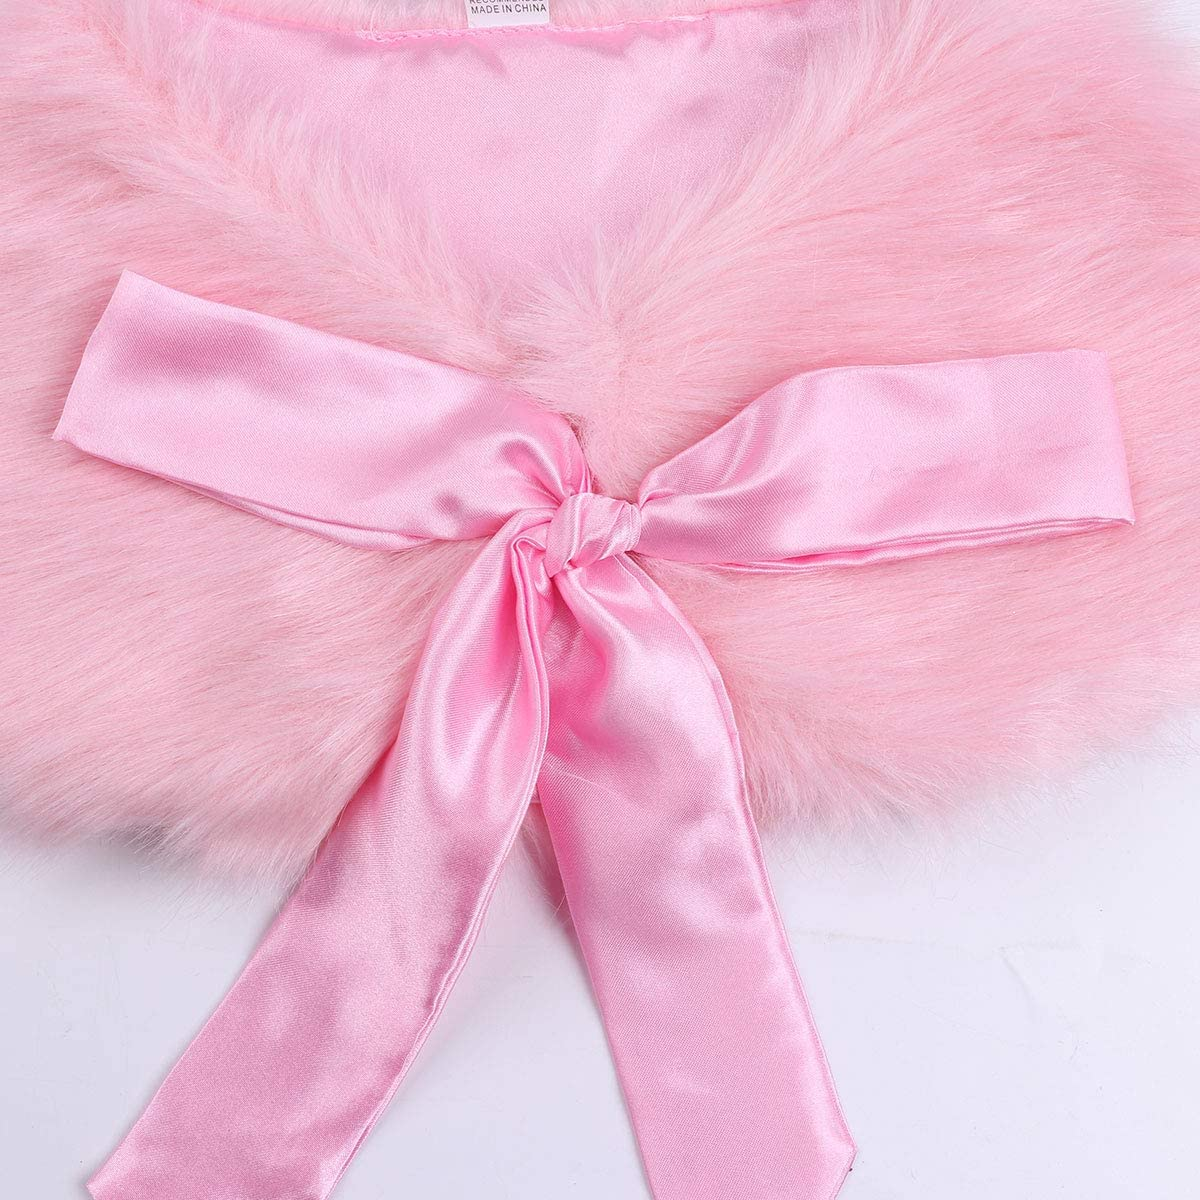 inlzdz Kids Girls Faux Fur Wrap Princess Shawl Tippet Bolero Shrug Shoulder Wedding Party Flower Girl Dress Cover Up Coat Cape